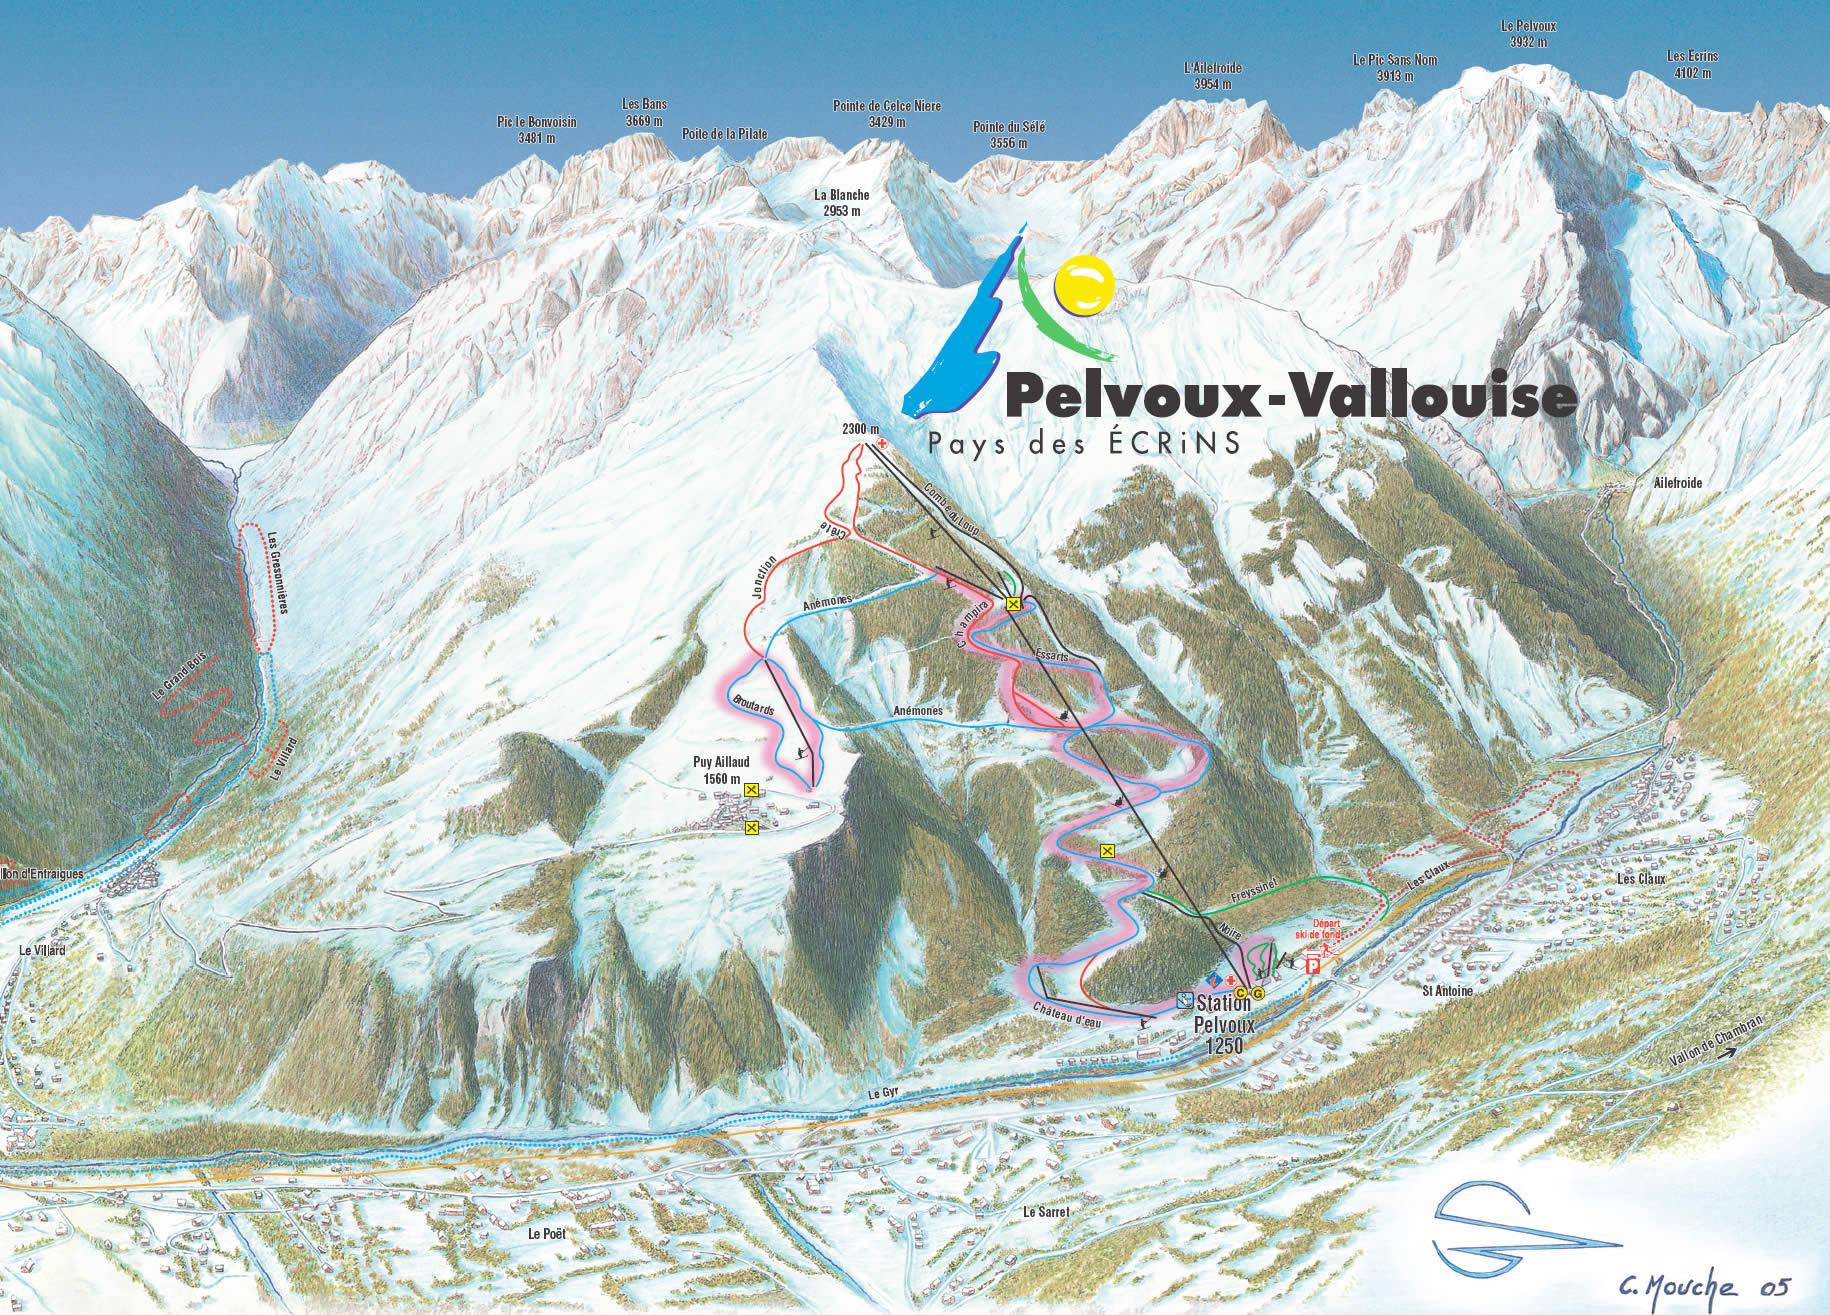 snow depth map with Pistemap on Lake Mountain additionally LimonePiemonte furthermore MonteAmiata together with KronplatzPlandeCorones moreover Ski Resort.